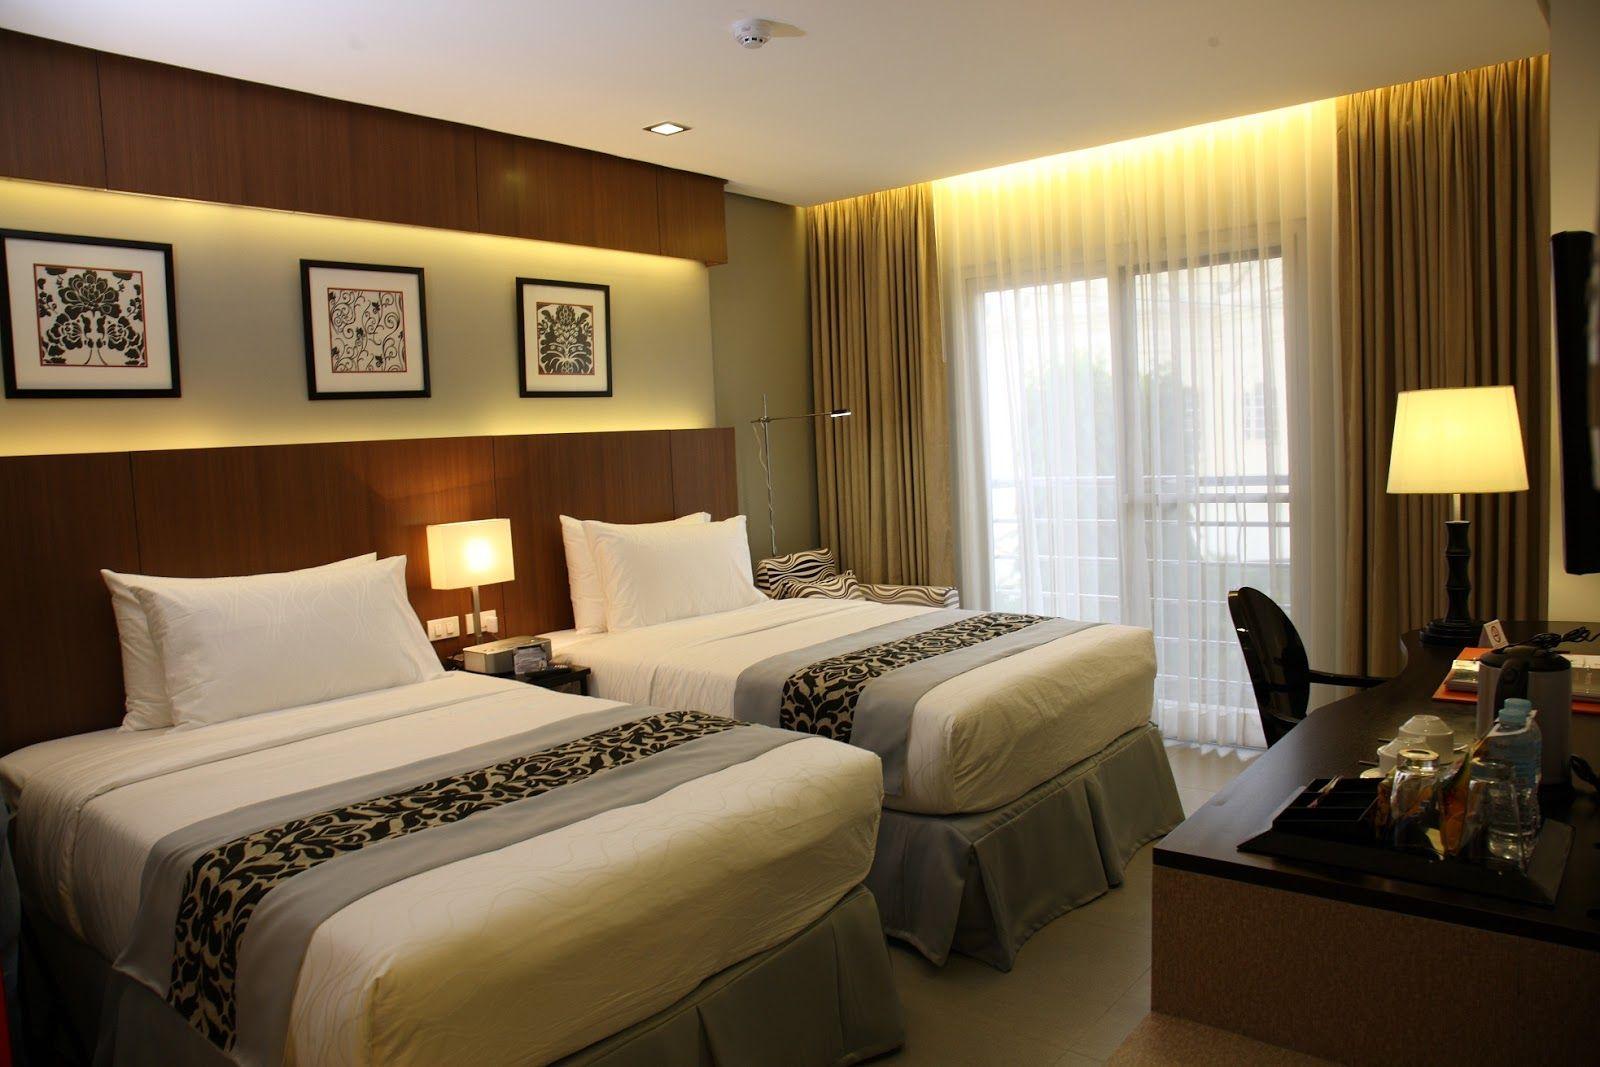 Designer Bedroom Lighting Indirect Lighting Ideas For Doble Delux Bedroom Design  Bedroom